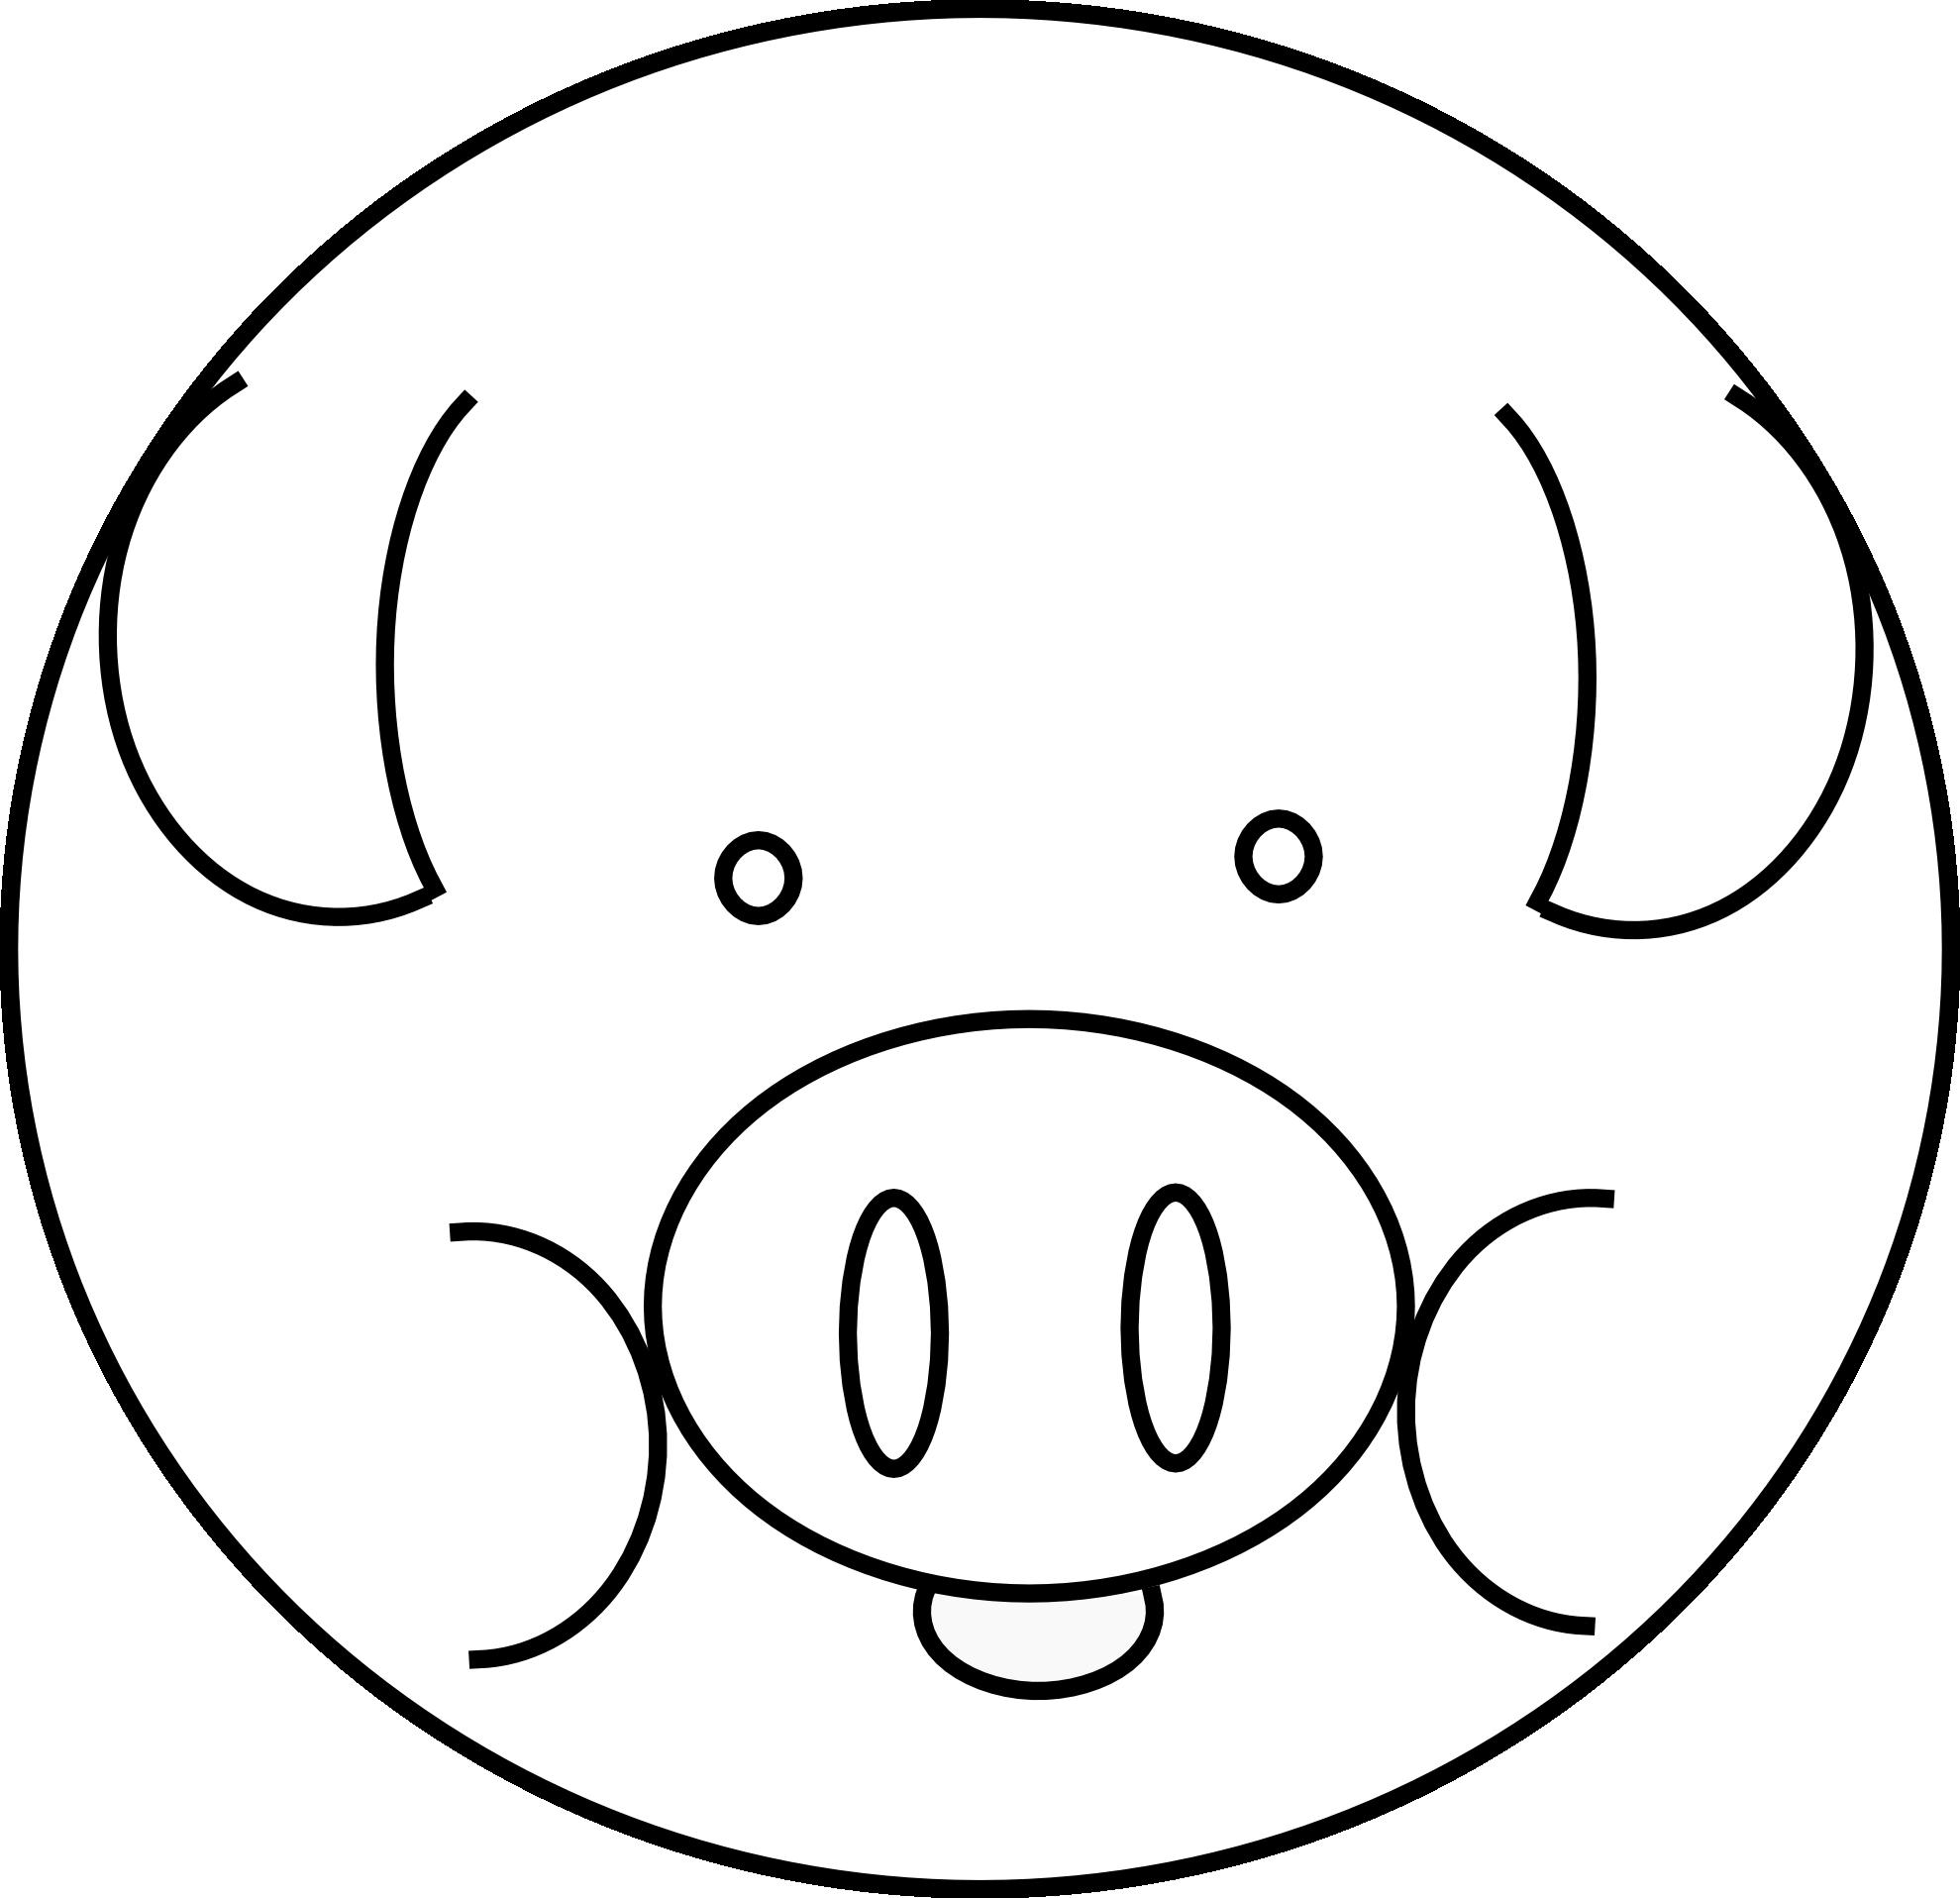 Free Pig Line Art, Download Free Clip Art, Free Clip Art ...